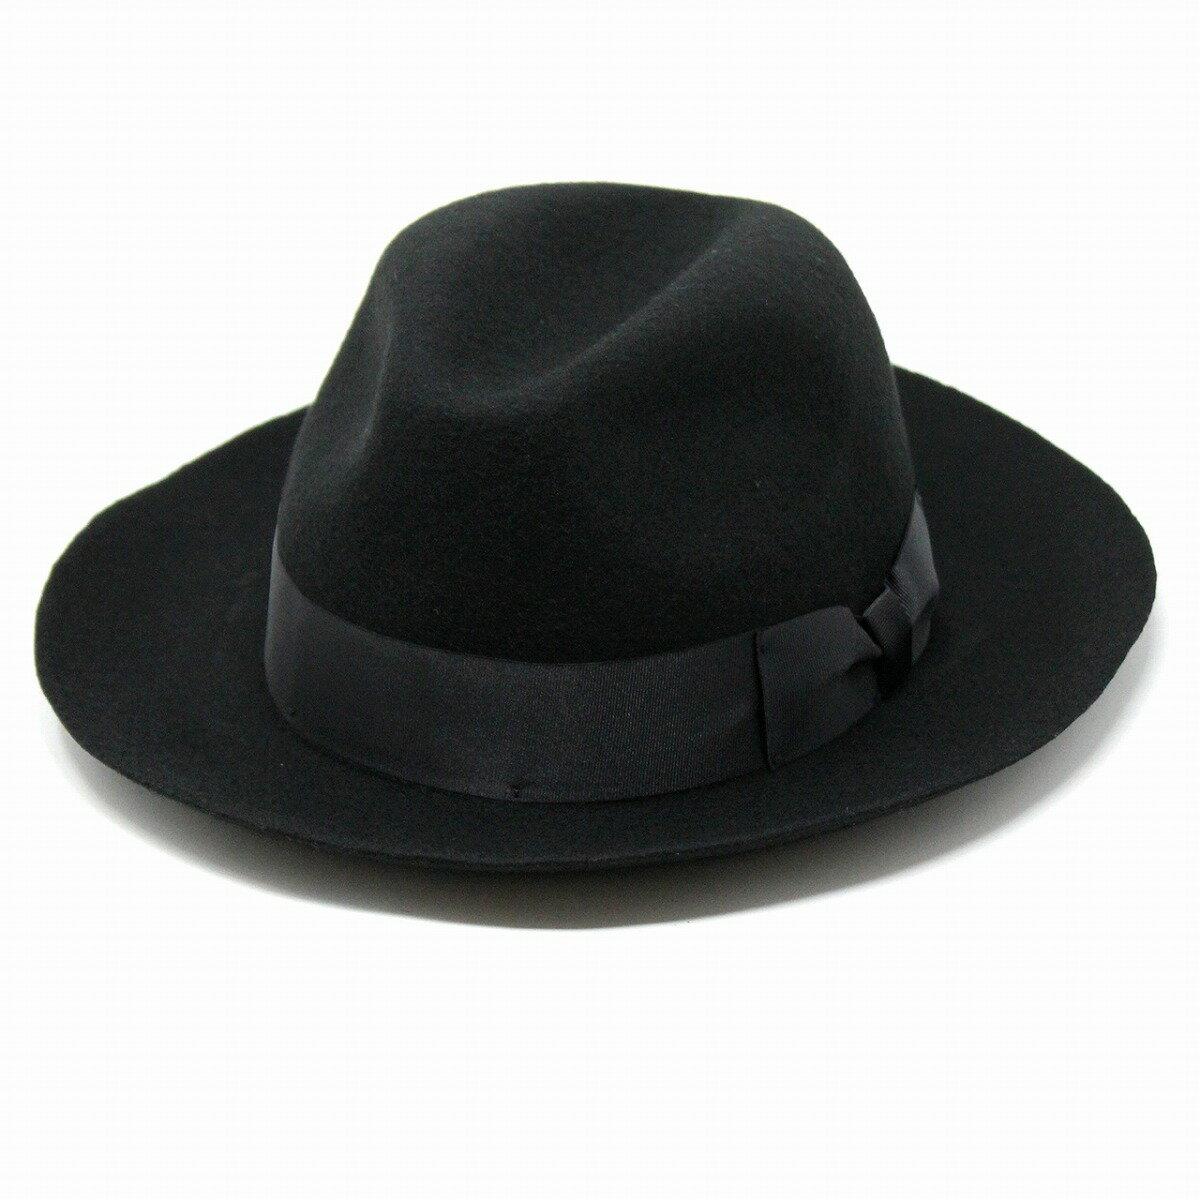 MAZZONI 中折れハット メンズ 秋冬 イタリア フェルトハット 中折れ帽 マッツォーニ フェルト帽 黒 ブラック(40代 50代 60代 70代 ファッション 紳士帽子 無地 ウール ウールハット 30代 フェルト帽子 プレゼント) [ fedora ]